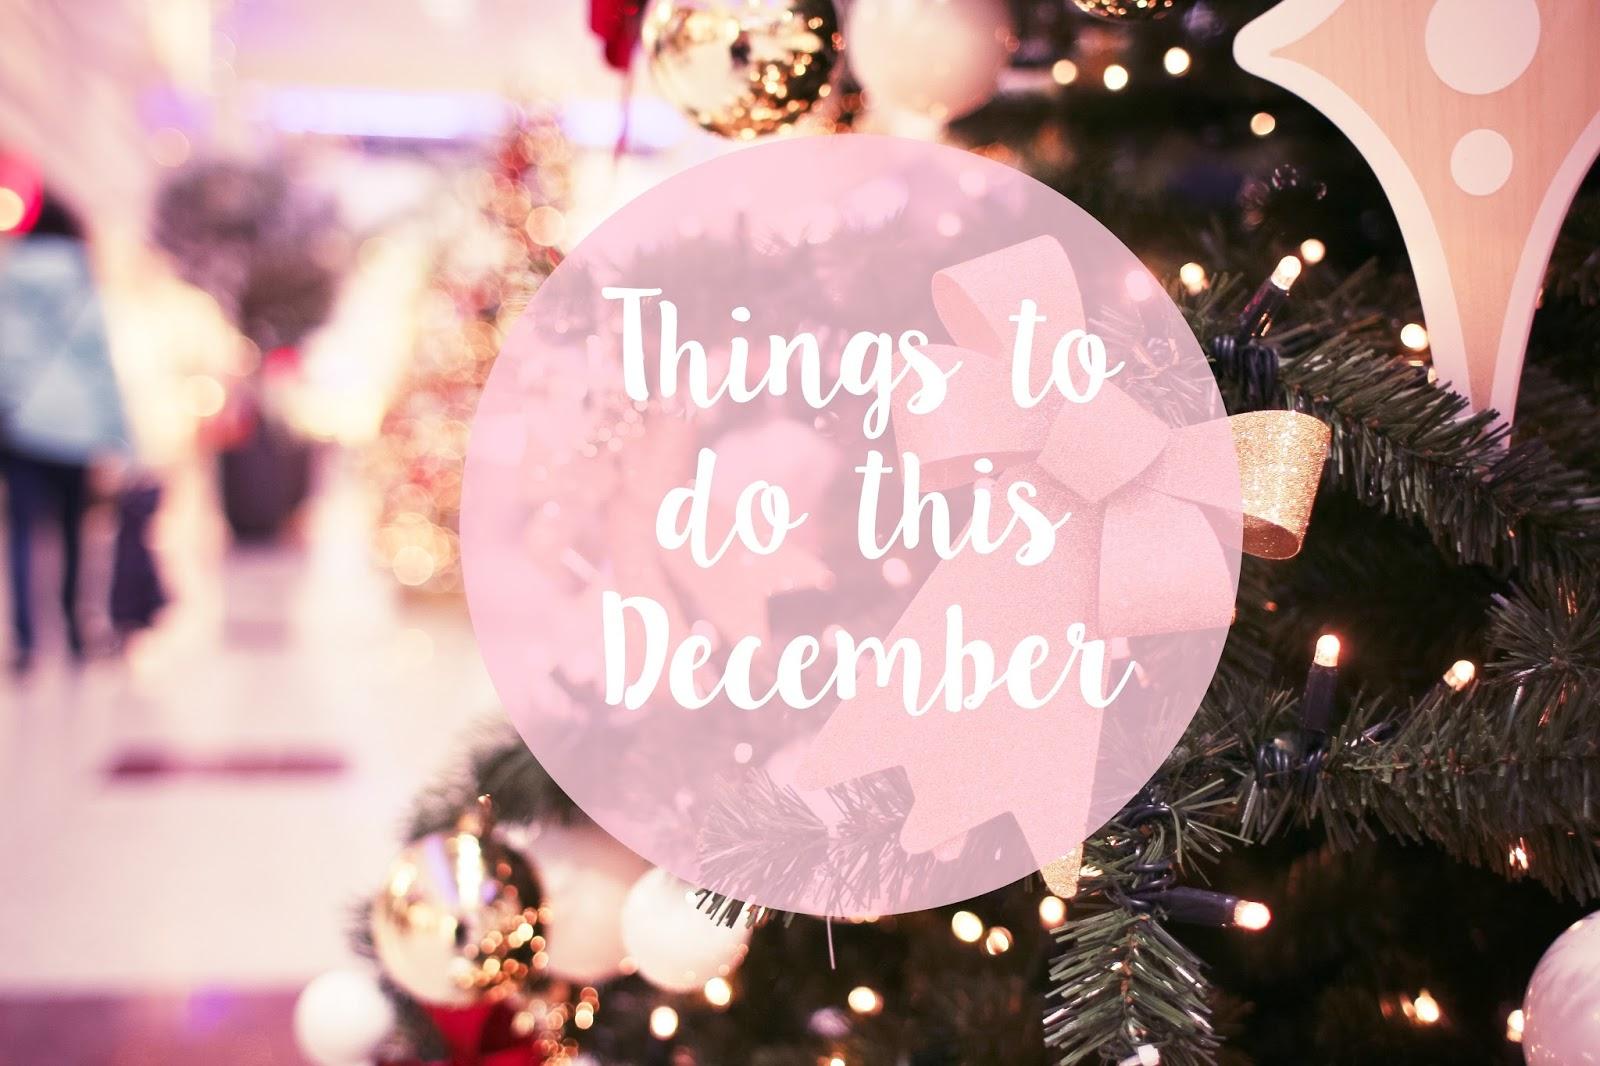 christmas, lifestyle, things to do at christmas, things to do in december, festive, christmas tree,